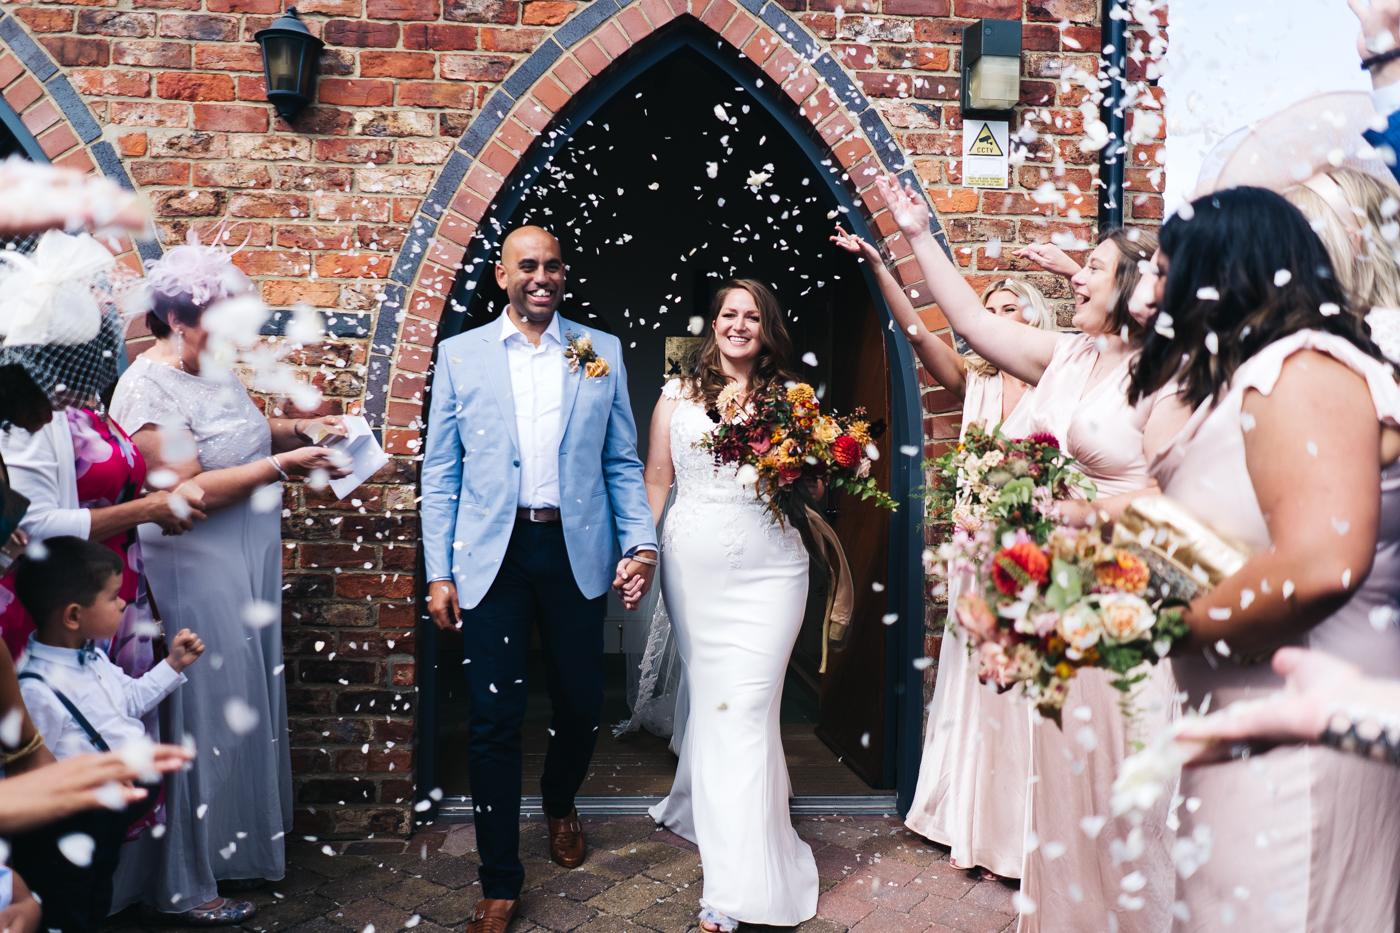 wedding-at-the-pheasant-harome-helmsley-north-yorkshire-wedding-photographer-0019.jpg